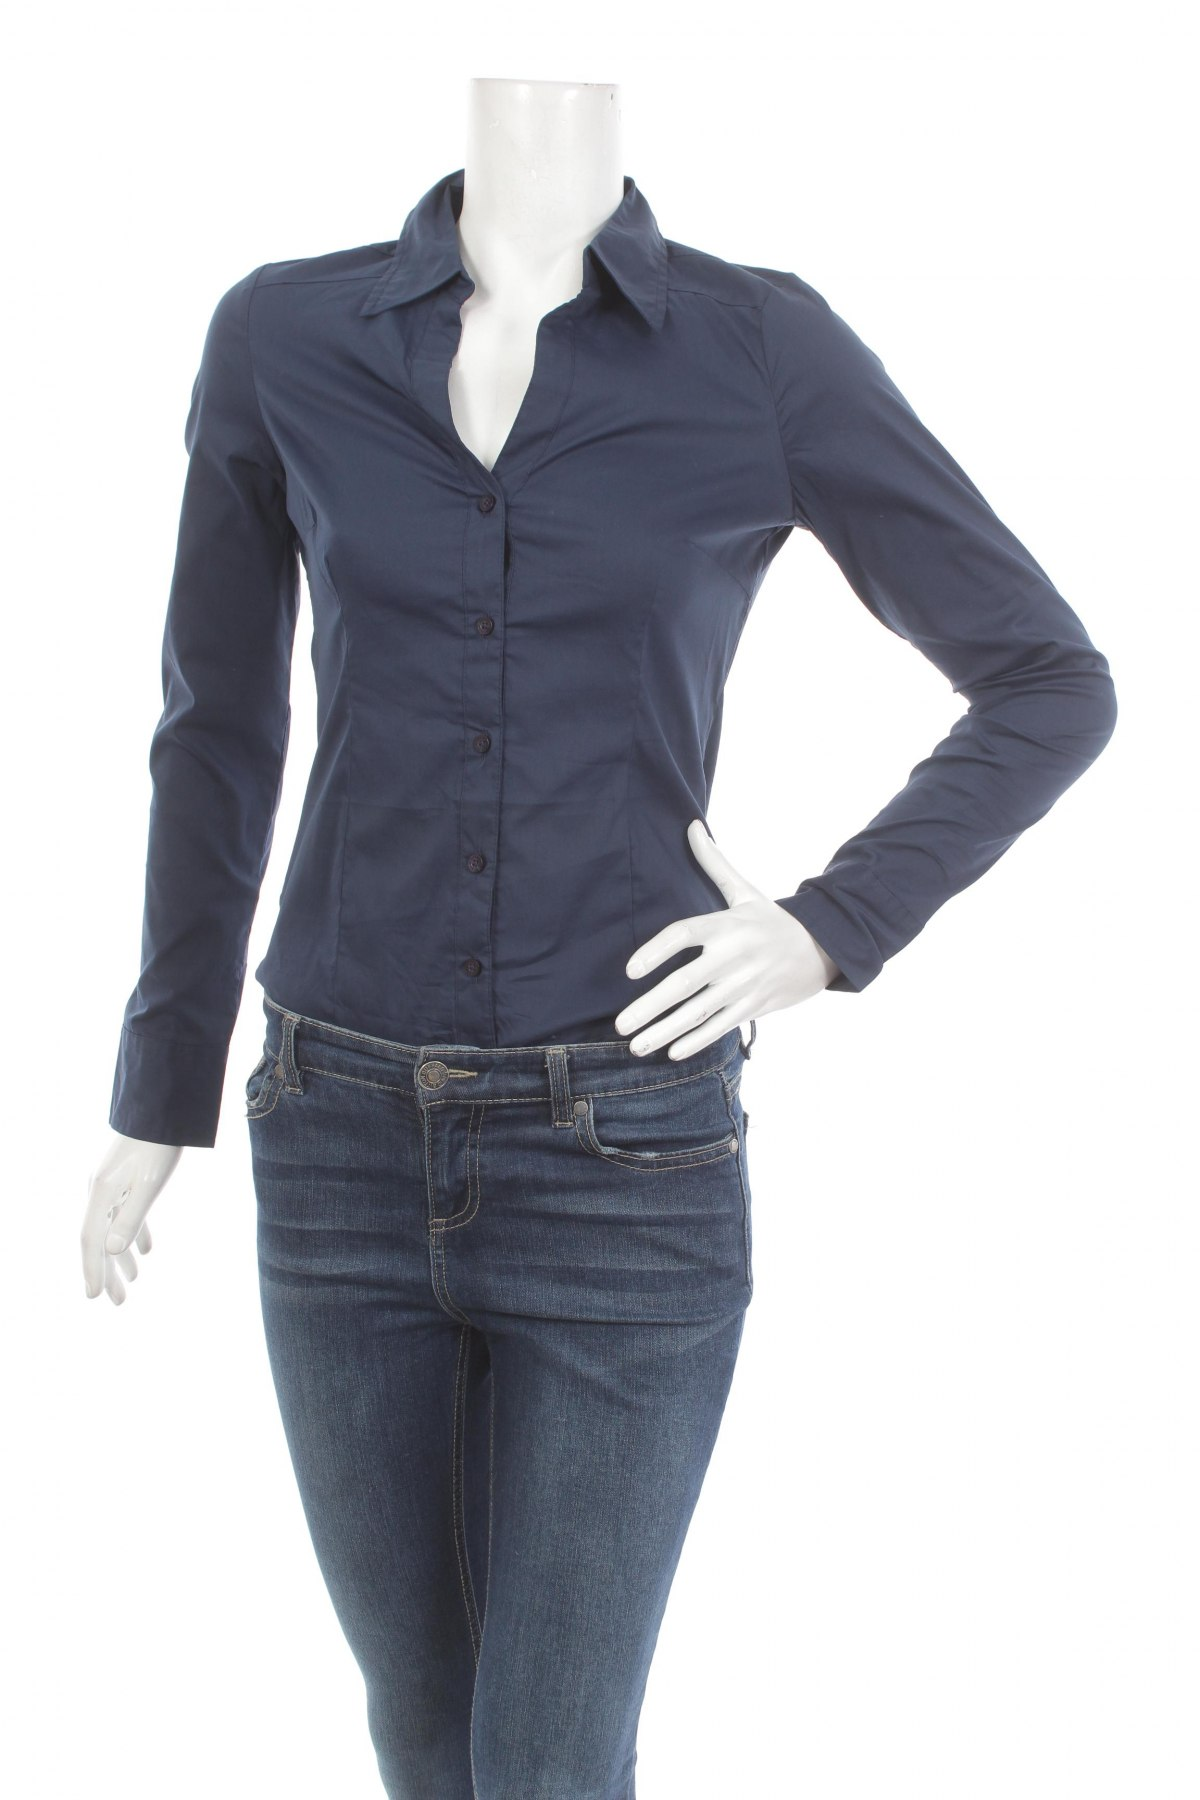 c06b17918cc5 Γυναικείο πουκάμισο-κορμάκι Vero Moda - σε συμφέρουσα τιμή στο Remix ...